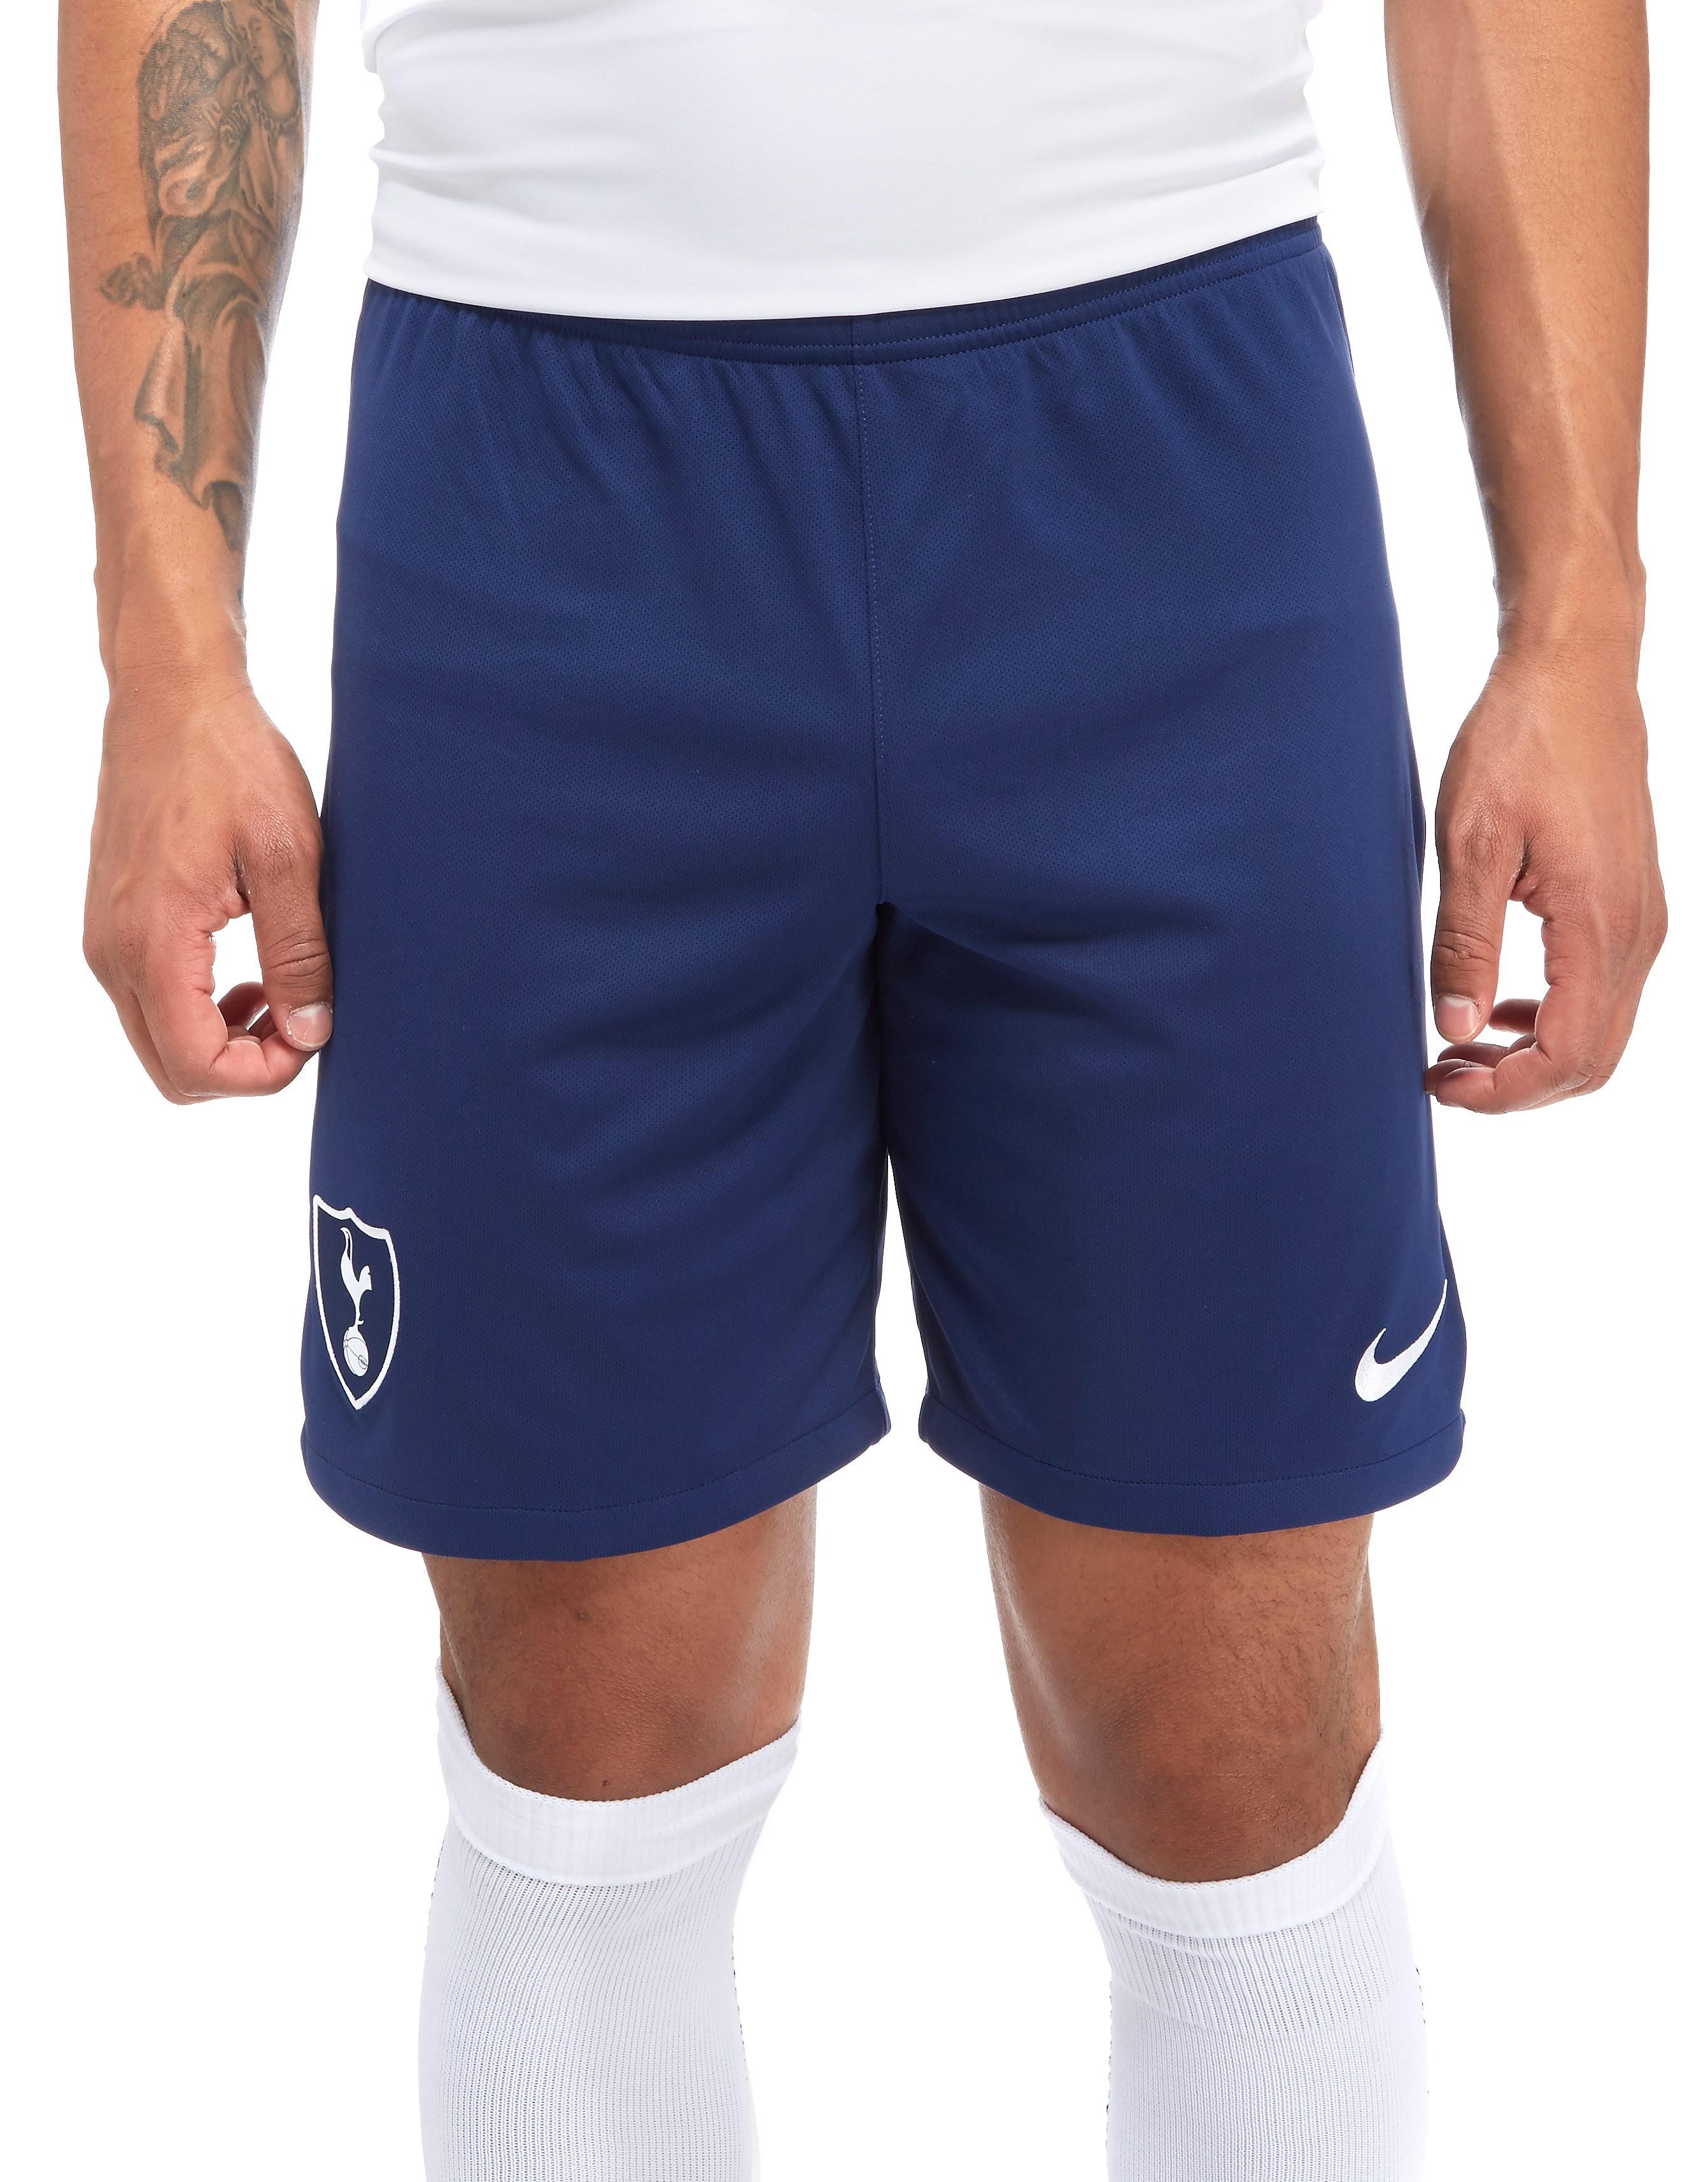 Nike Tottenham Hotspur 2017/18 Home Shorts